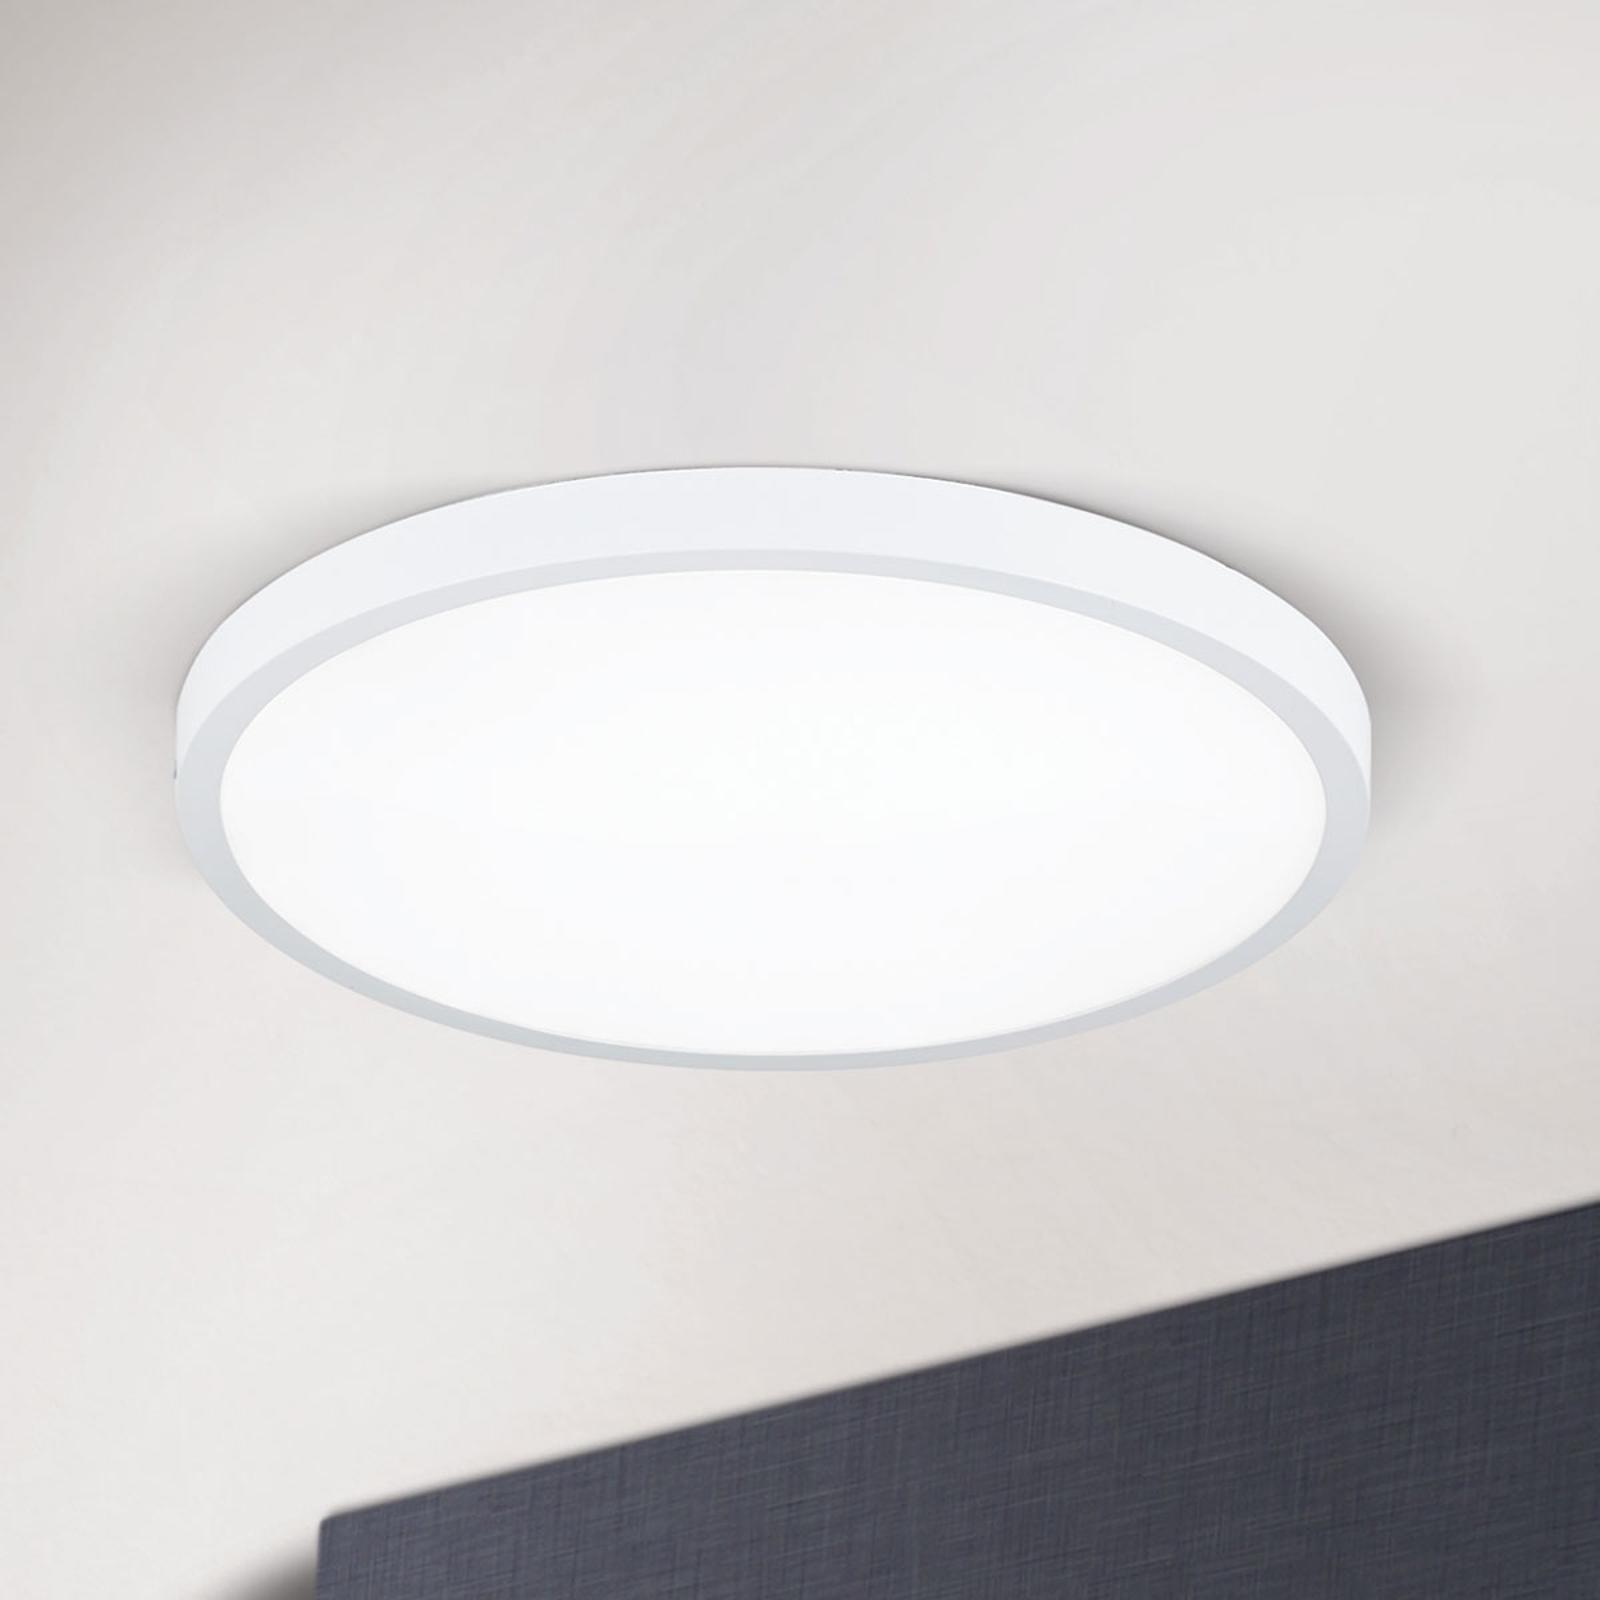 Ultraflache LED-Deckenleuchte Lero Ø 40 cm